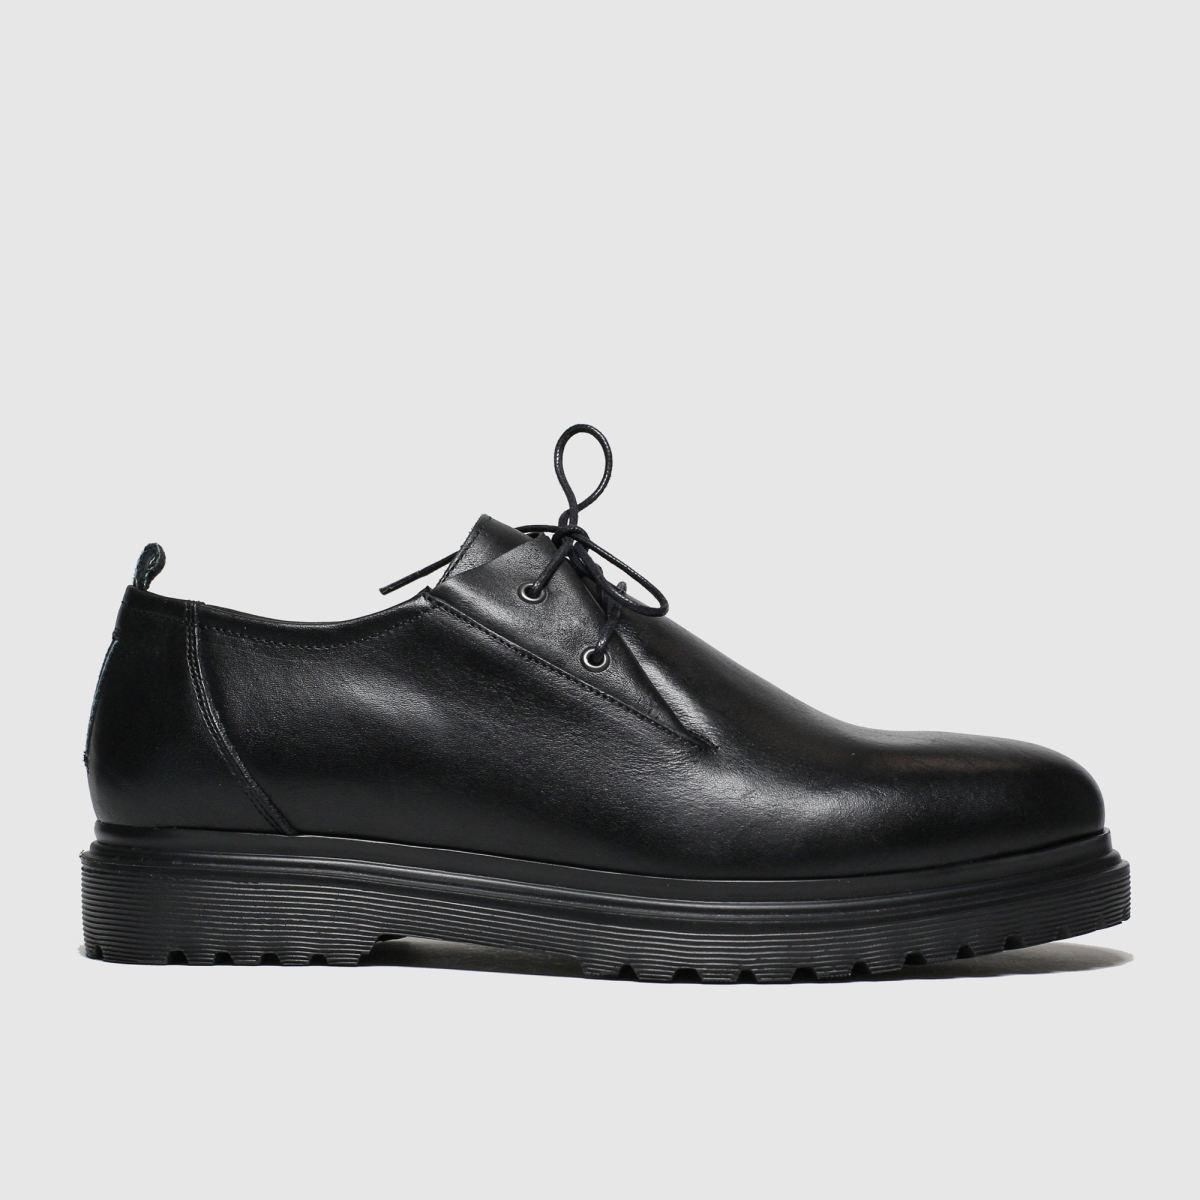 Shoe the Bear Shoe The Bear Black Davis Shoes